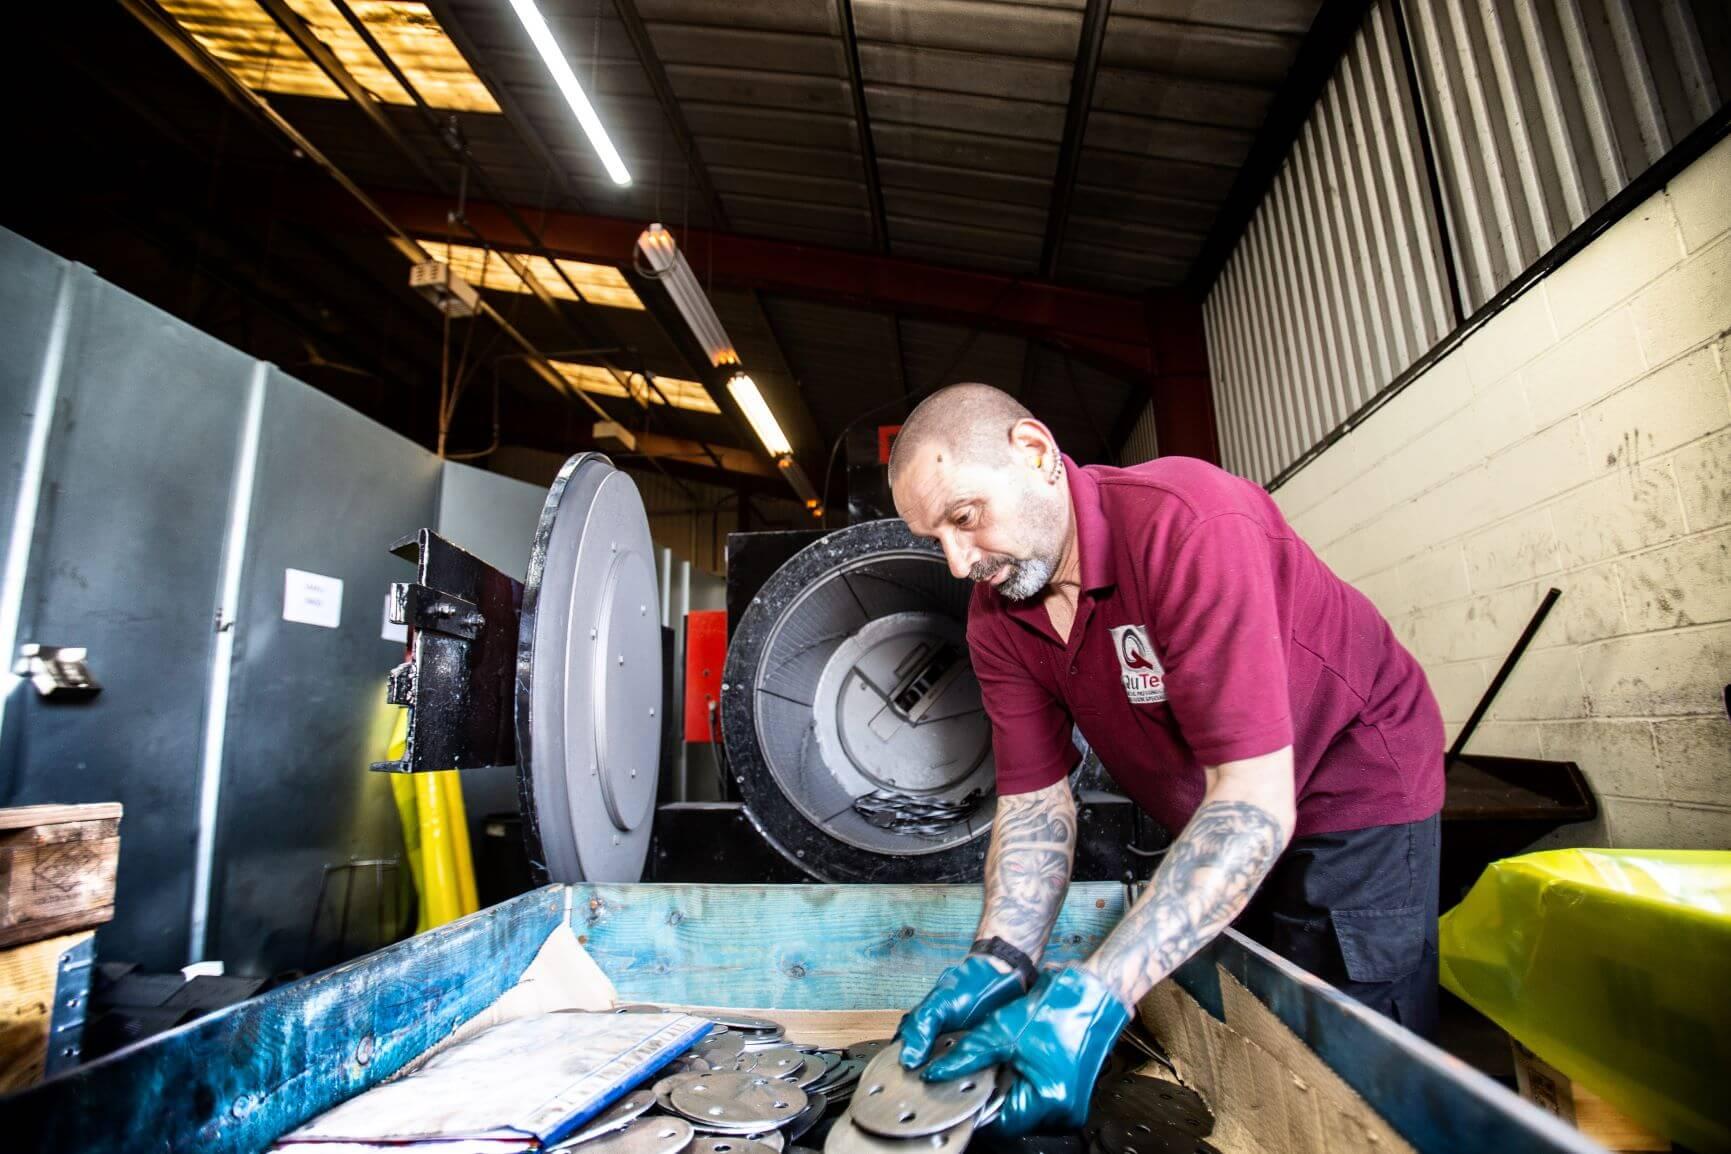 Qutec Shotblasting and Metal Finishing Services